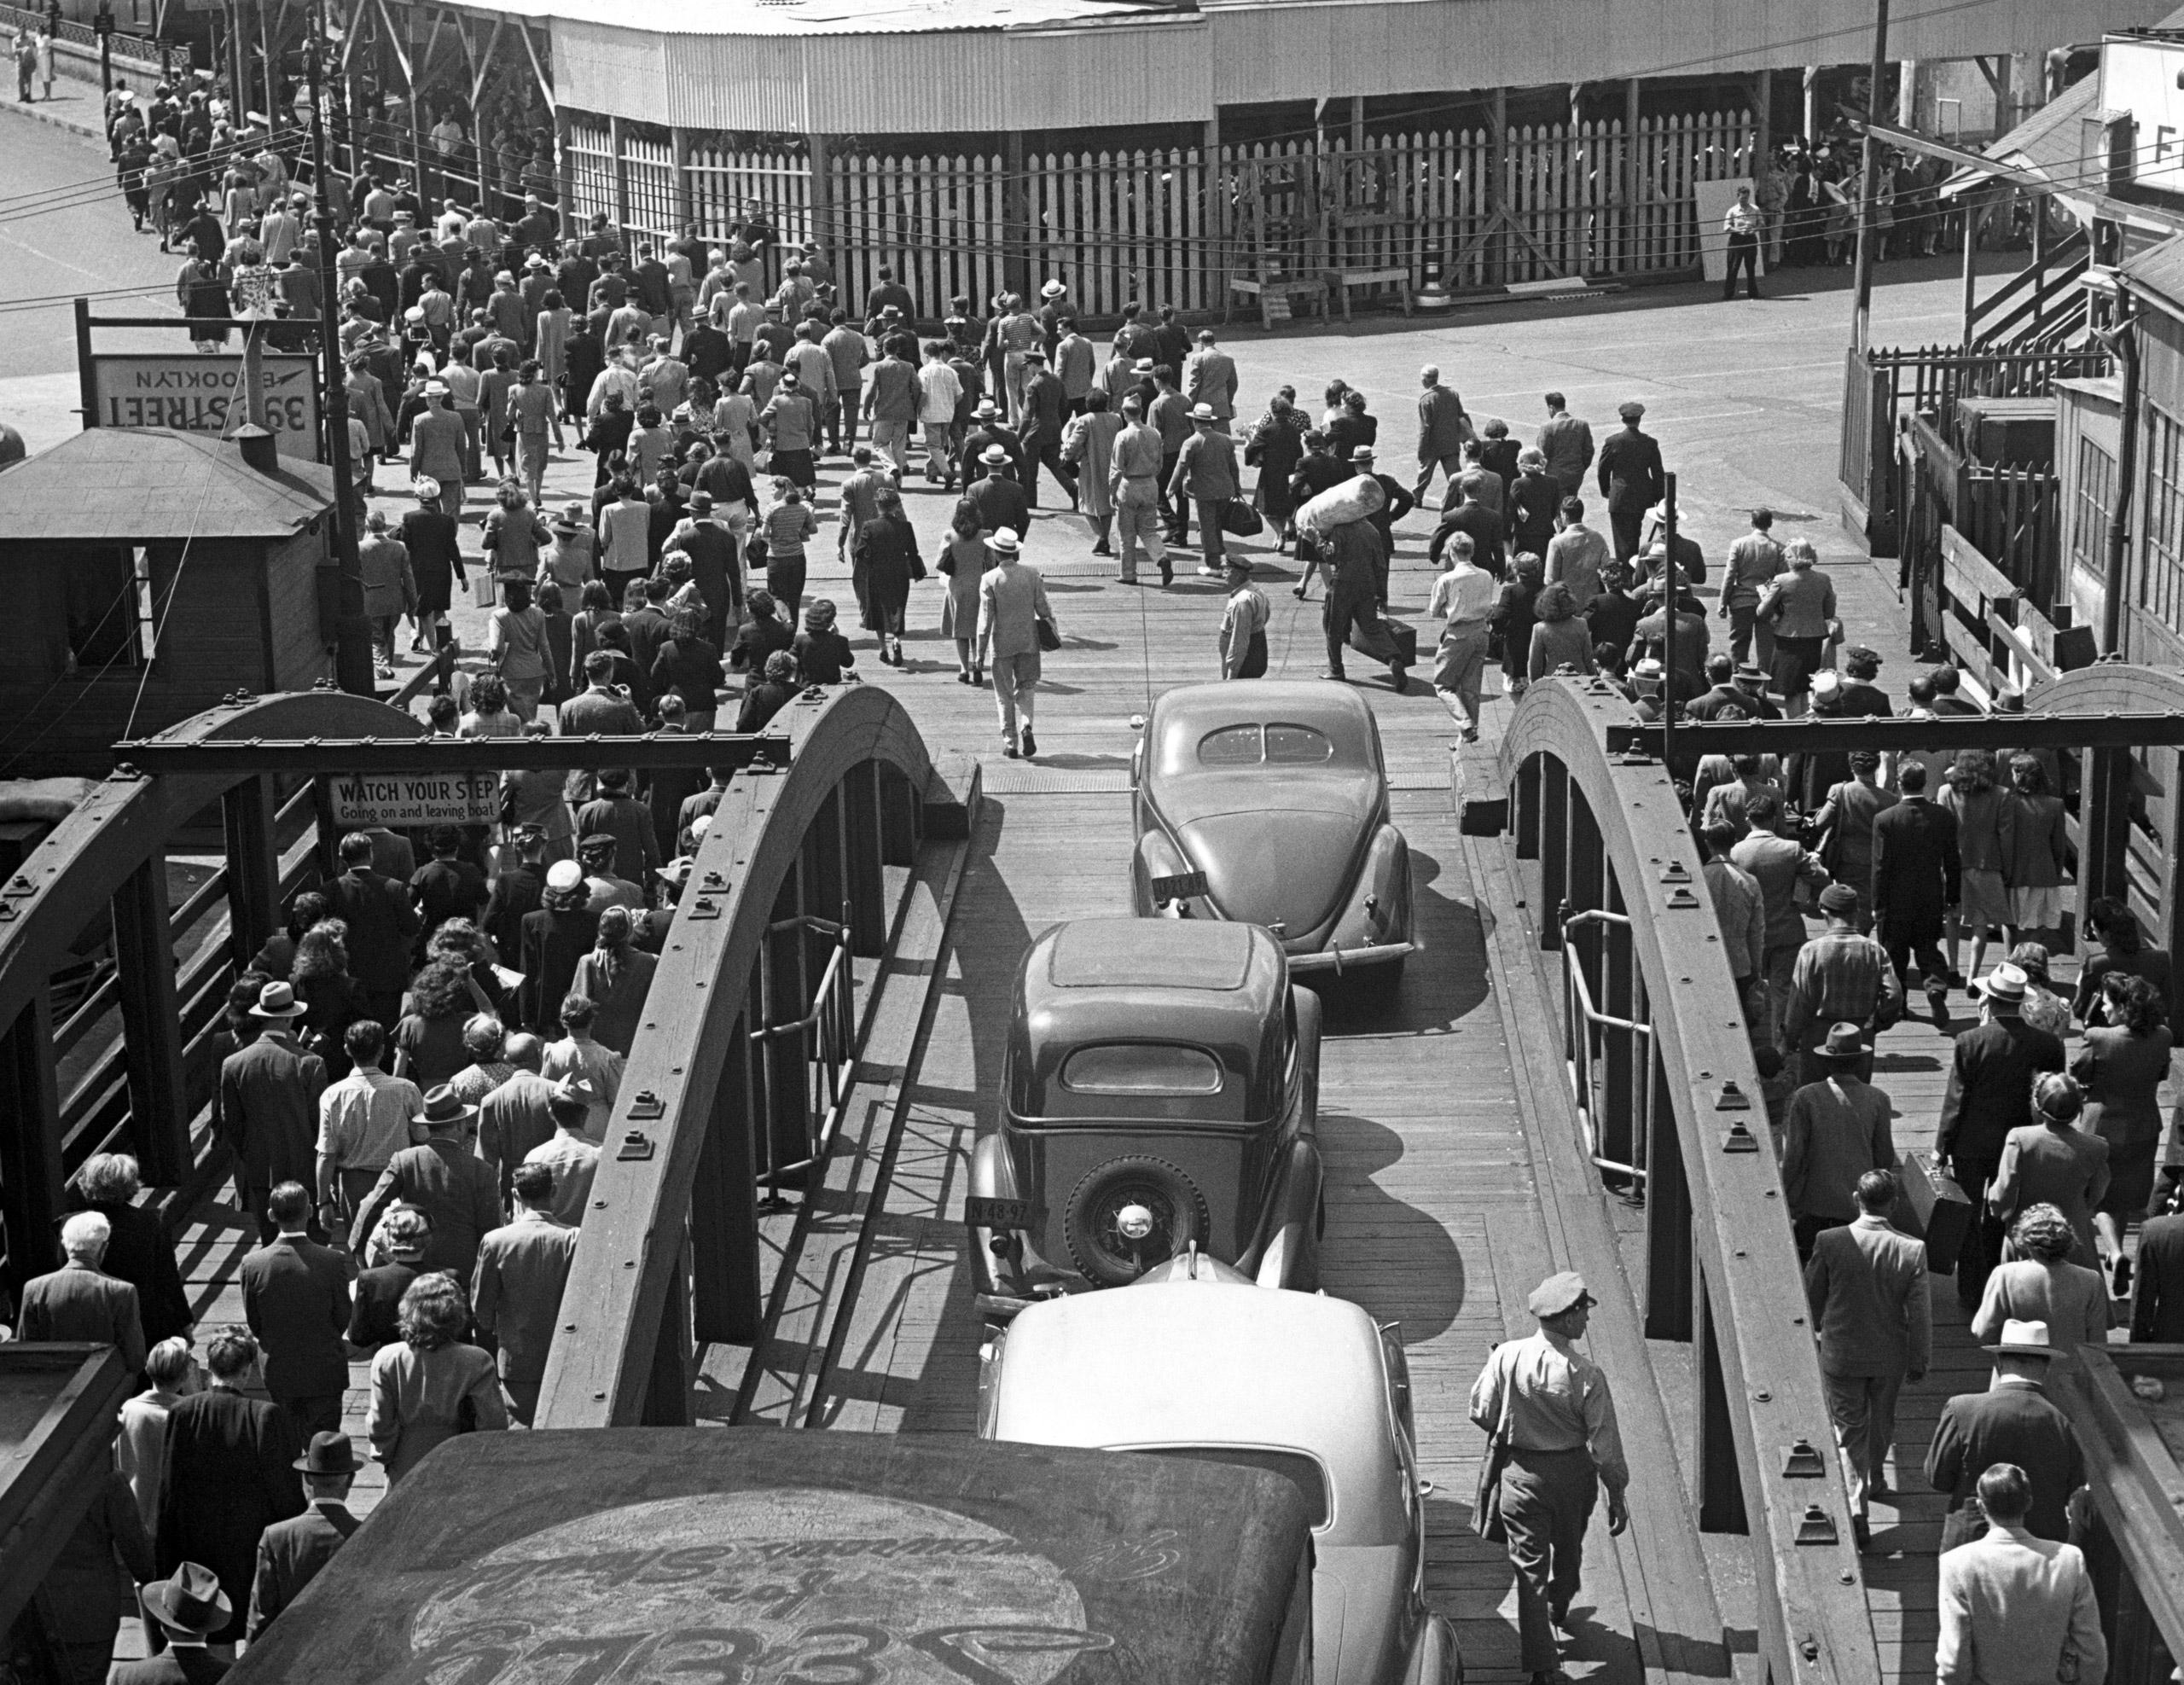 Passengers leaving ferry in Brooklyn.